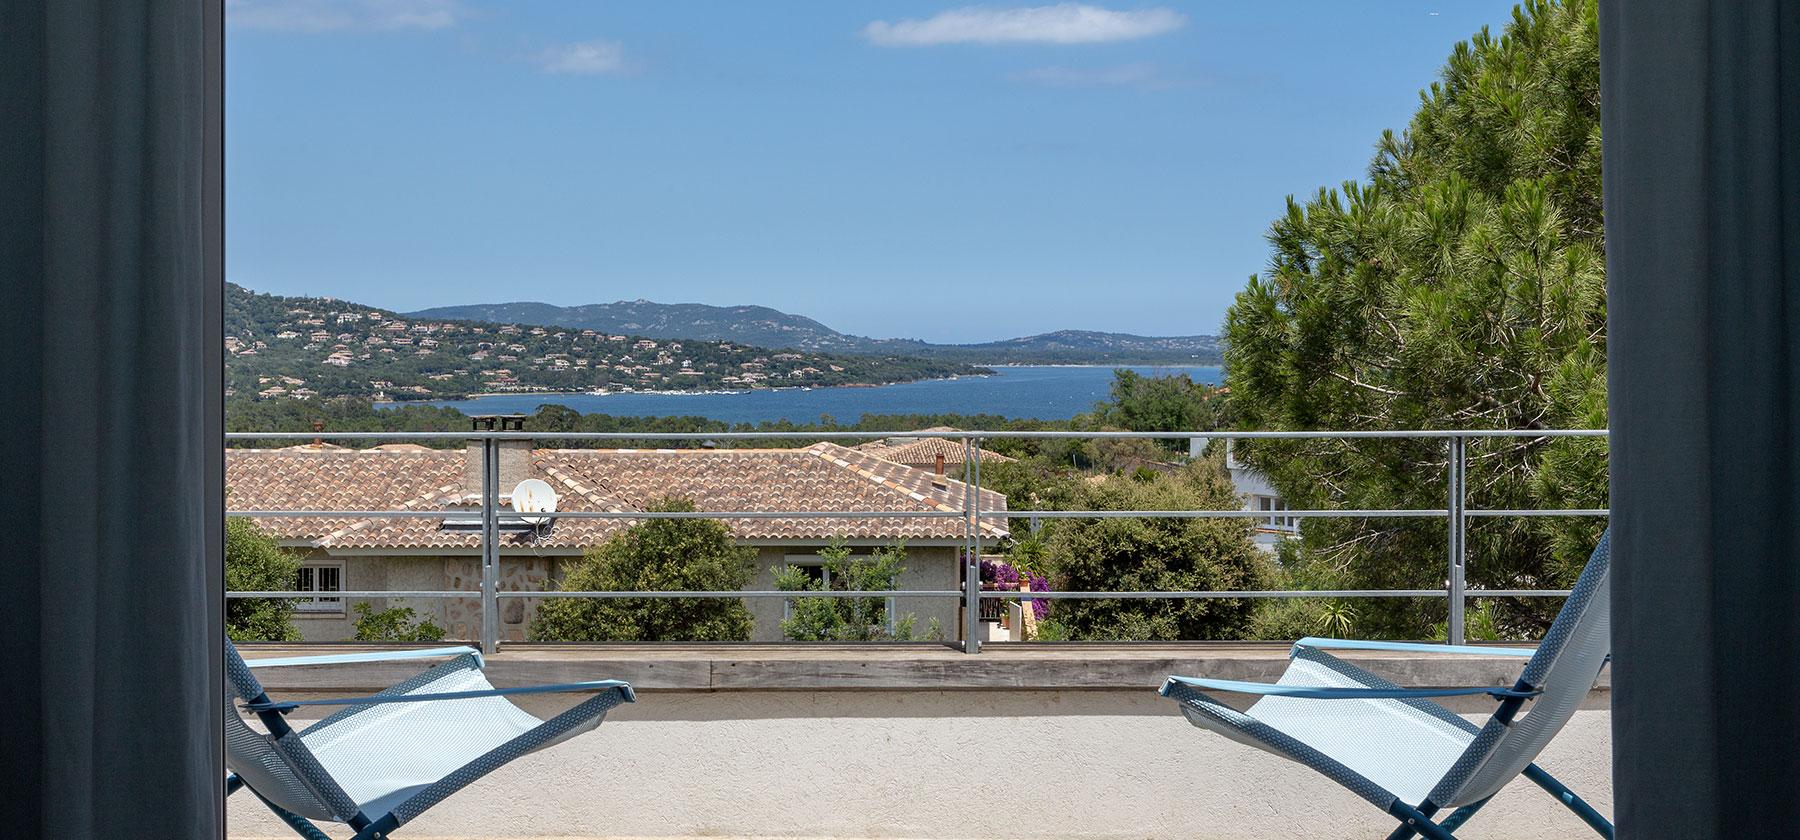 appartement-vue-mer-residence-4-etoiles-porto-vecchio-corse